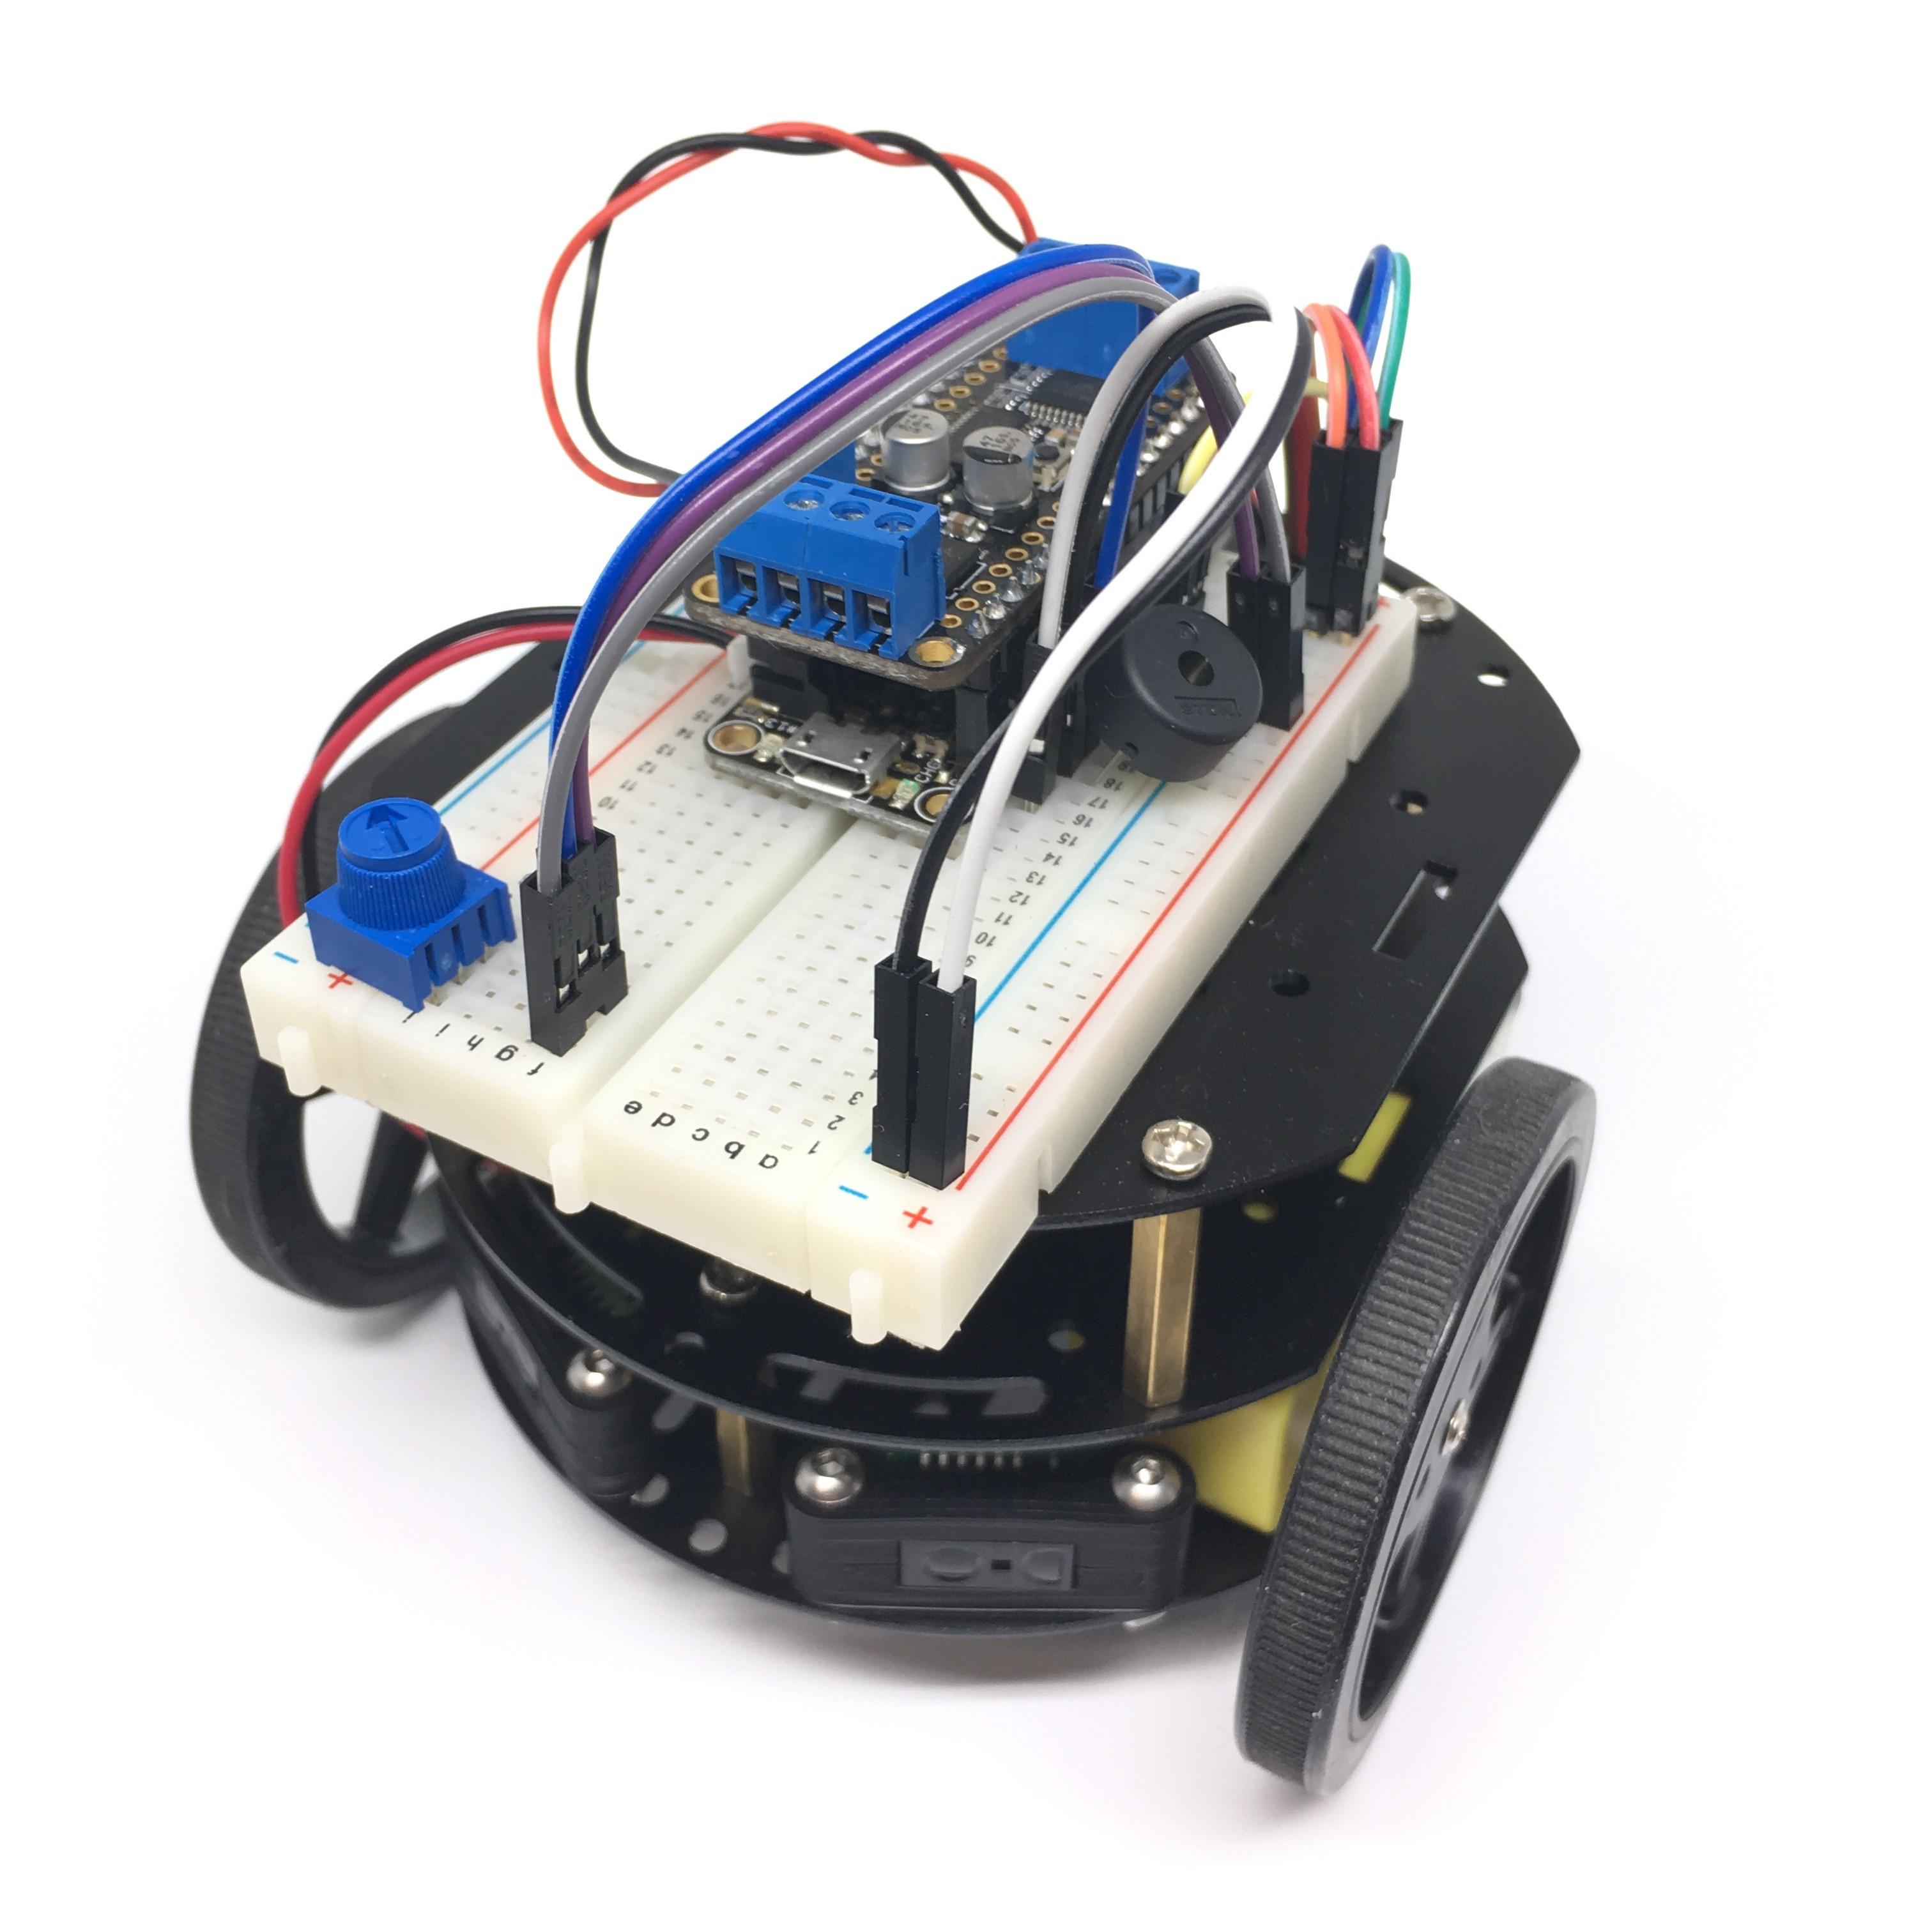 learn_arduino_robotics_IMG_0991.jpg